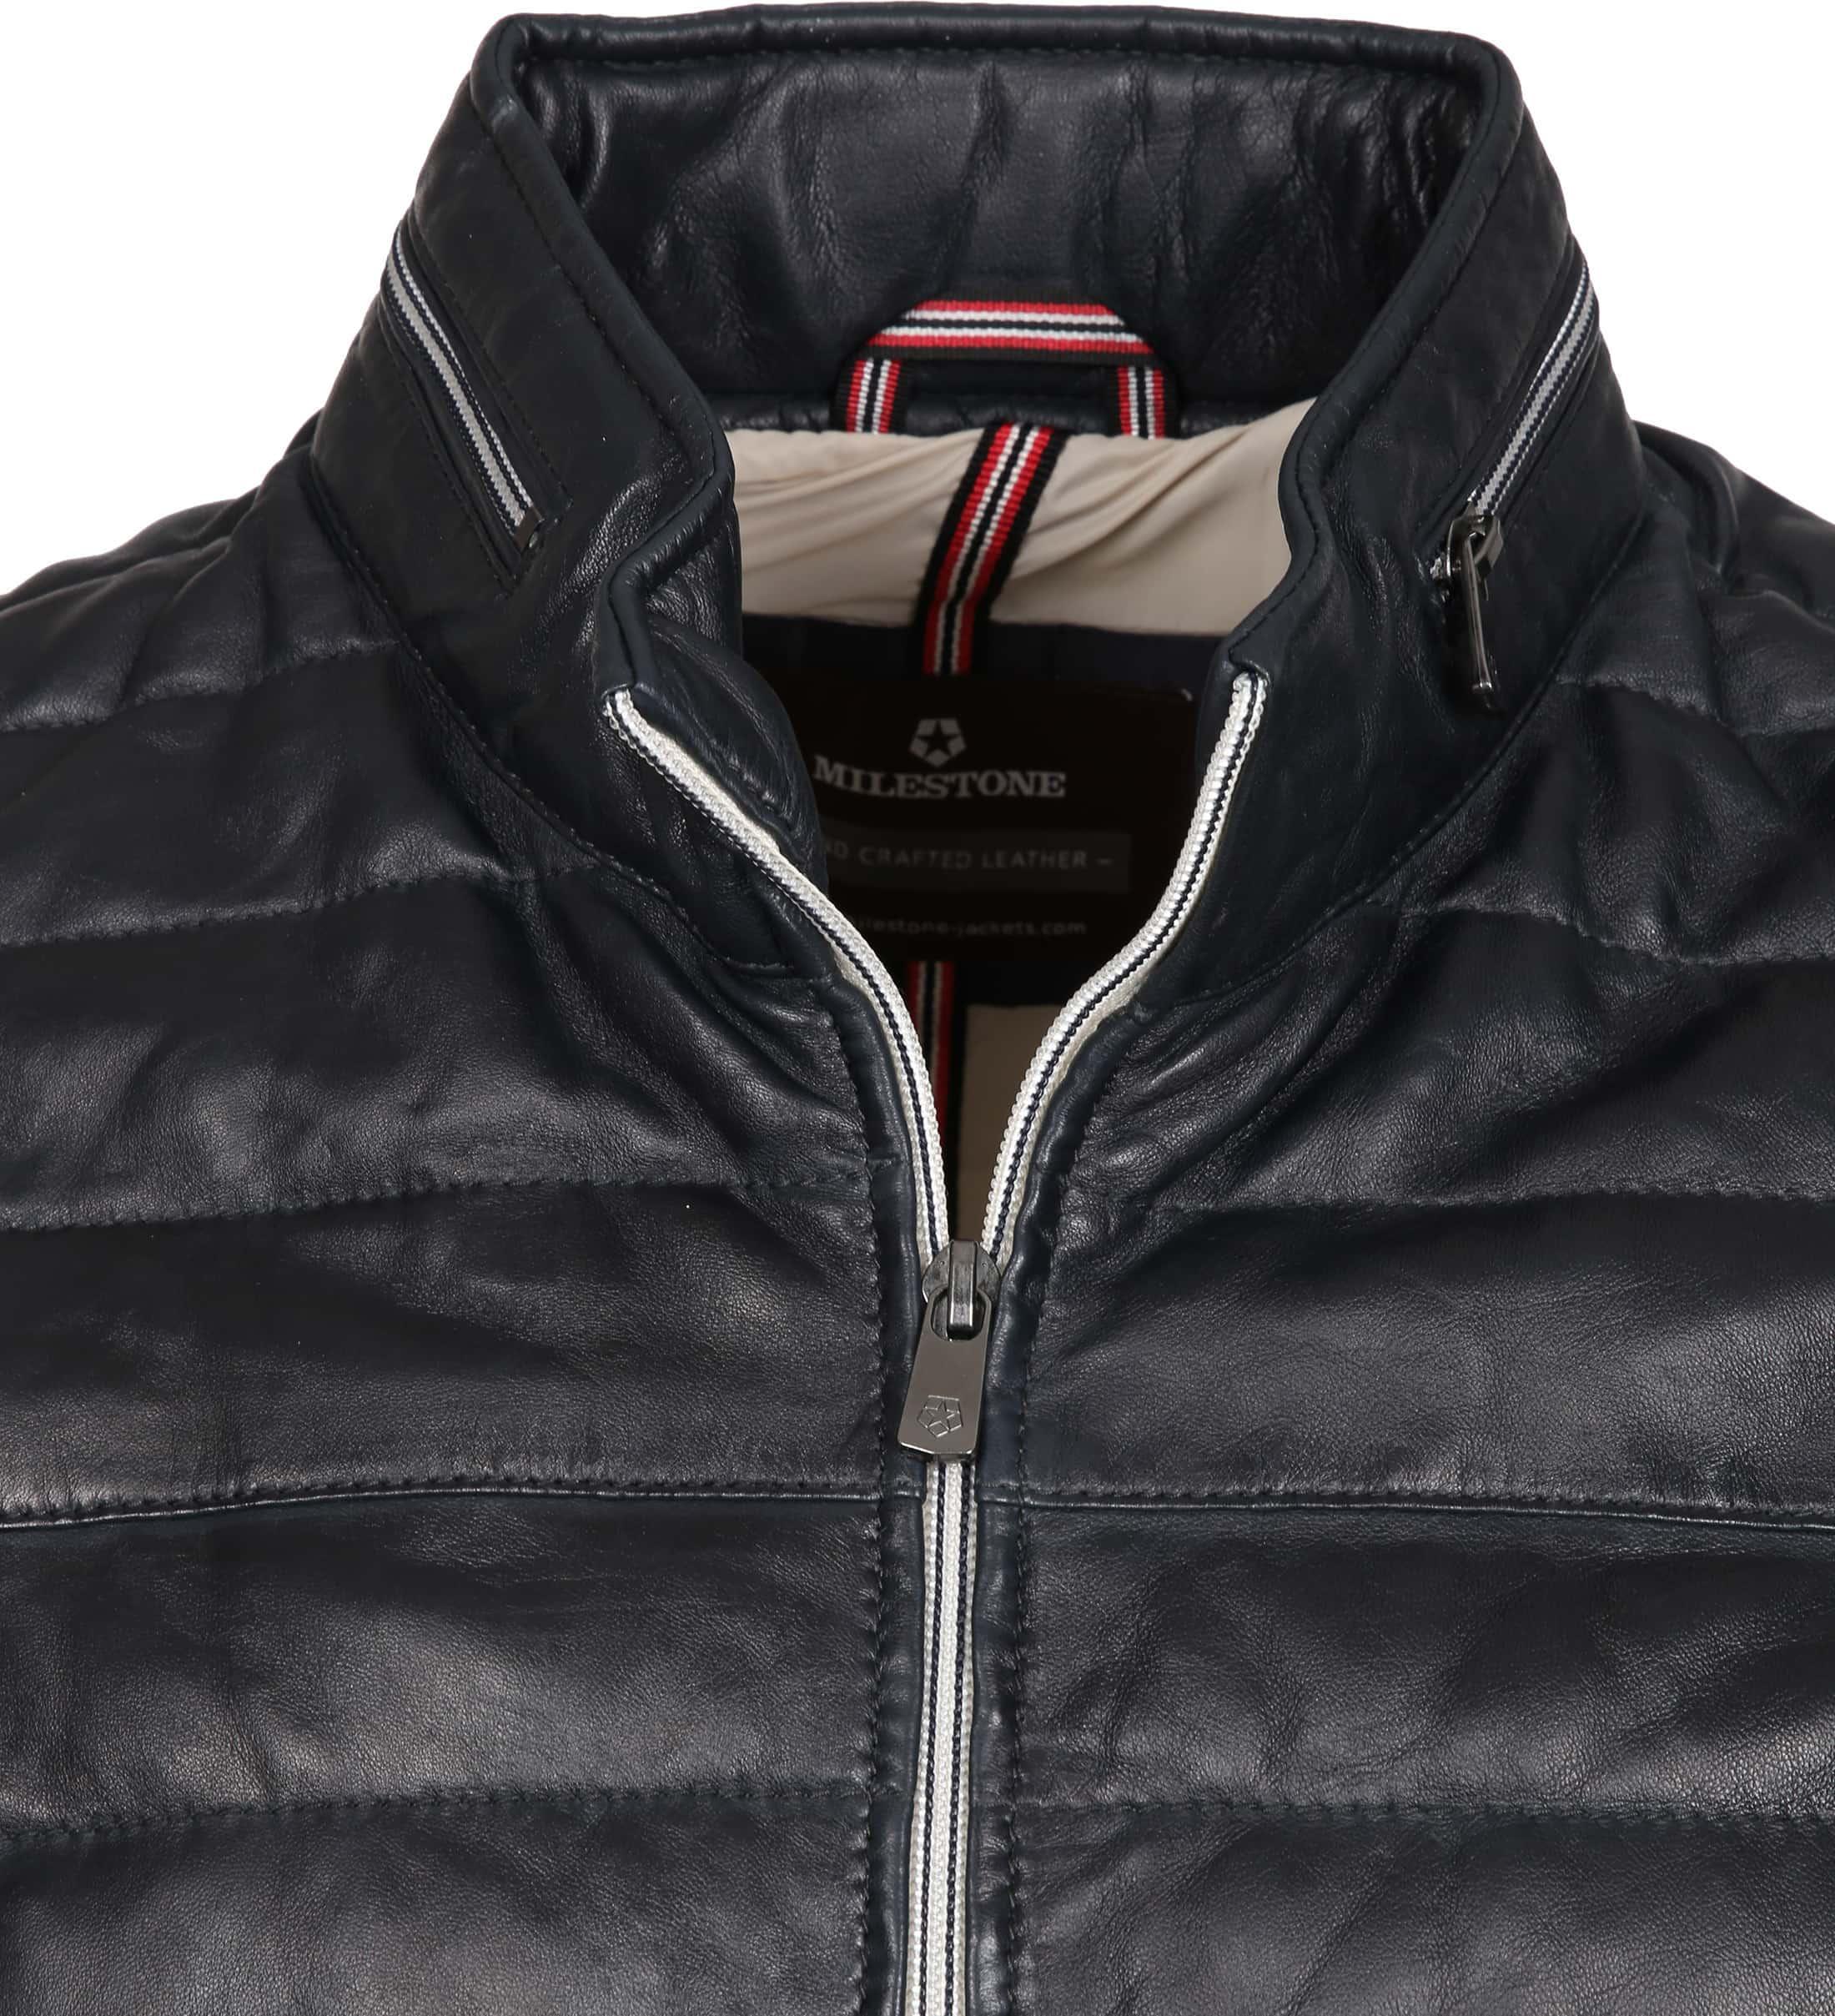 Milestone Tereno Leather Jacket Navy Grey foto 1